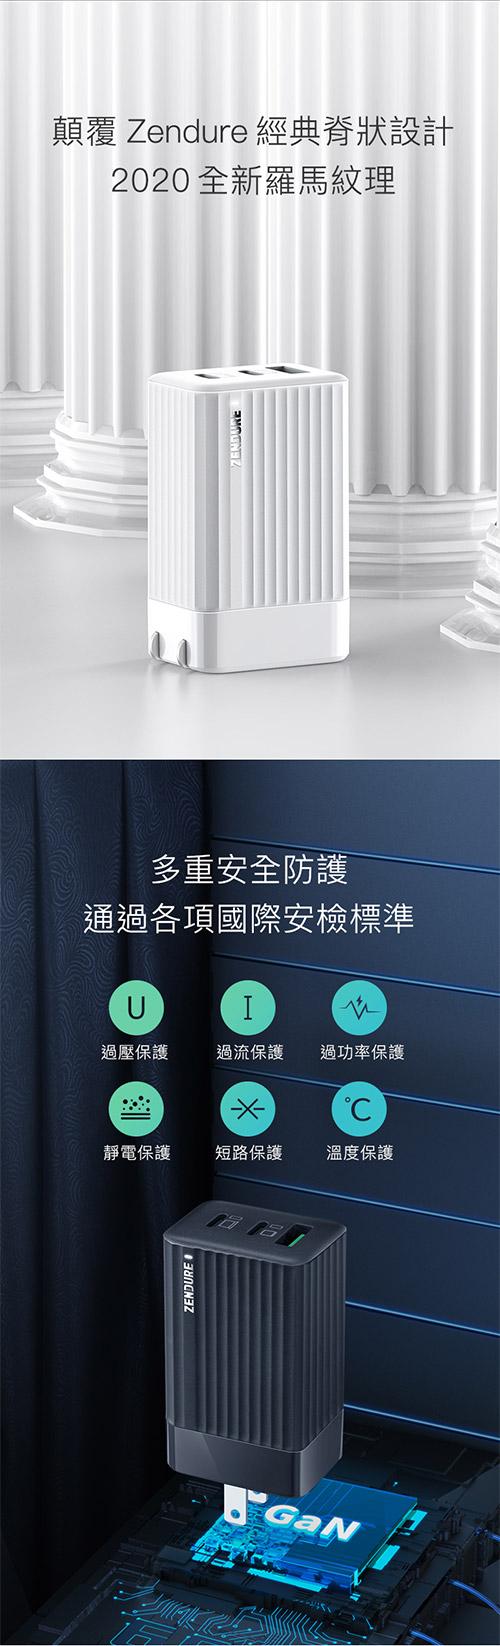 zendure-superport-s3-65w-gan-氮化鎵-多孔充電器